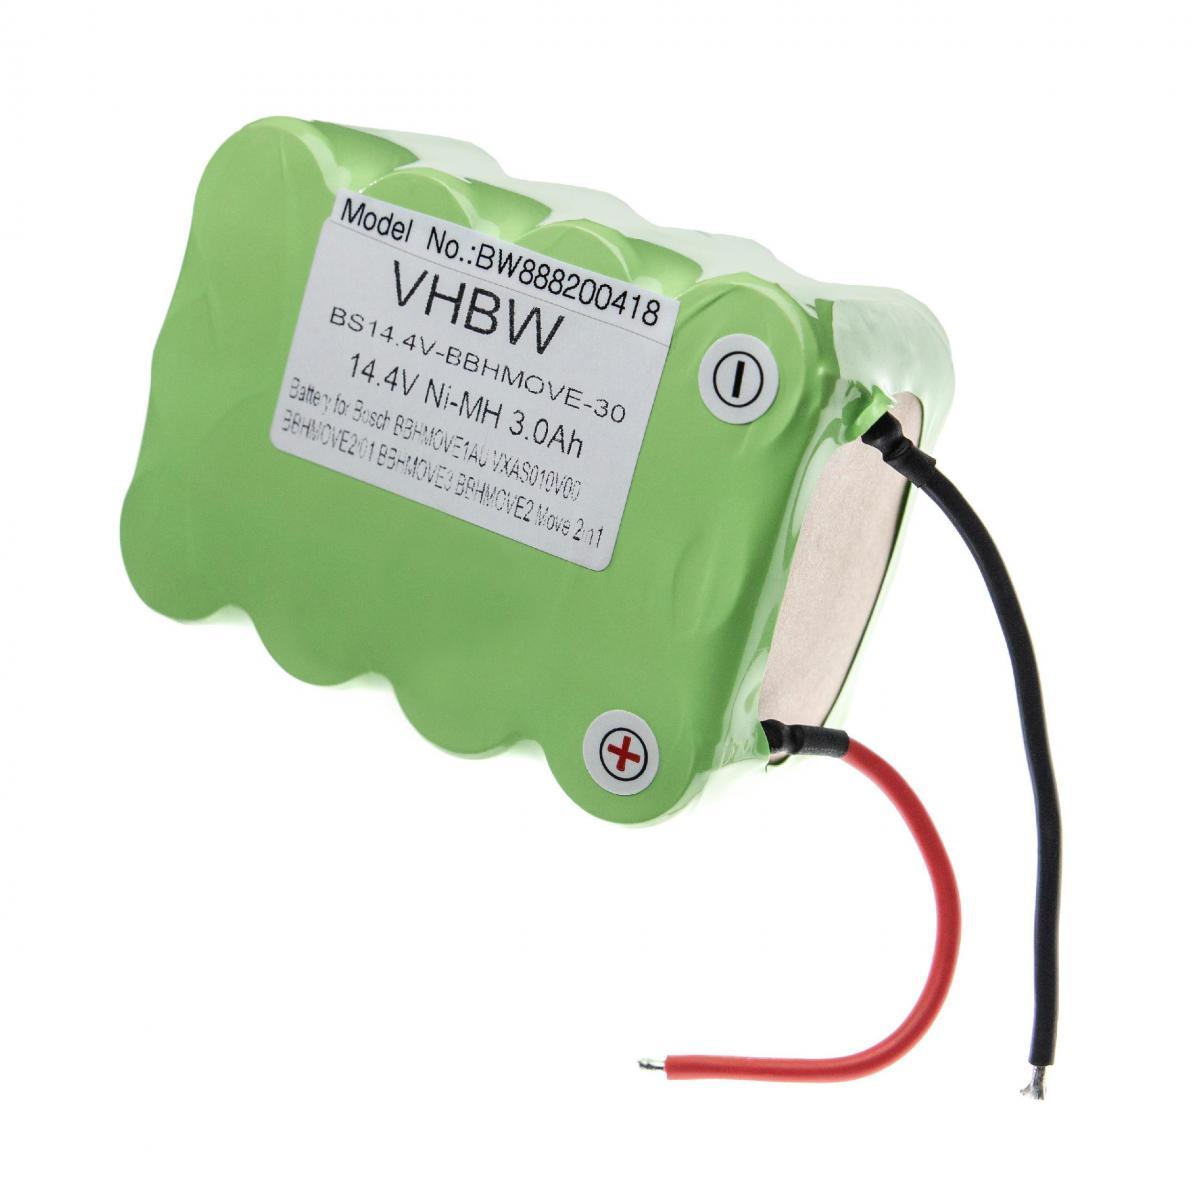 Vhbw vhbw batterie compatible avec Euro Pro Shark EV729, Pet Perfect Bagless, SV70, SV70 Pet Perfect aspirateur Home Cleaner